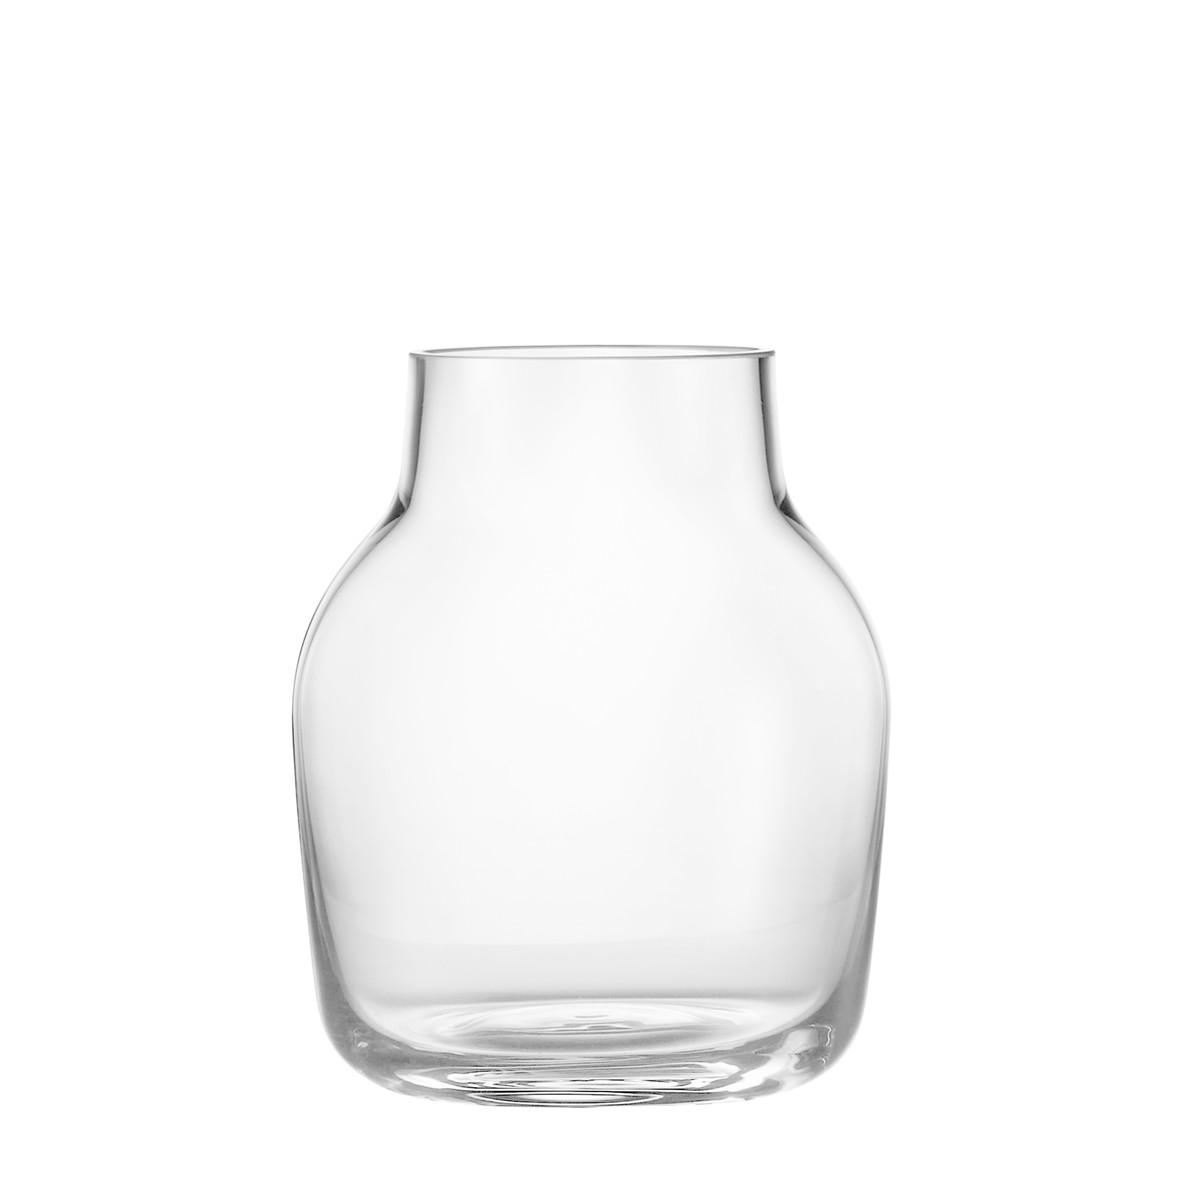 Muuto Silent Vase Clear 1 contemporary designer homeware